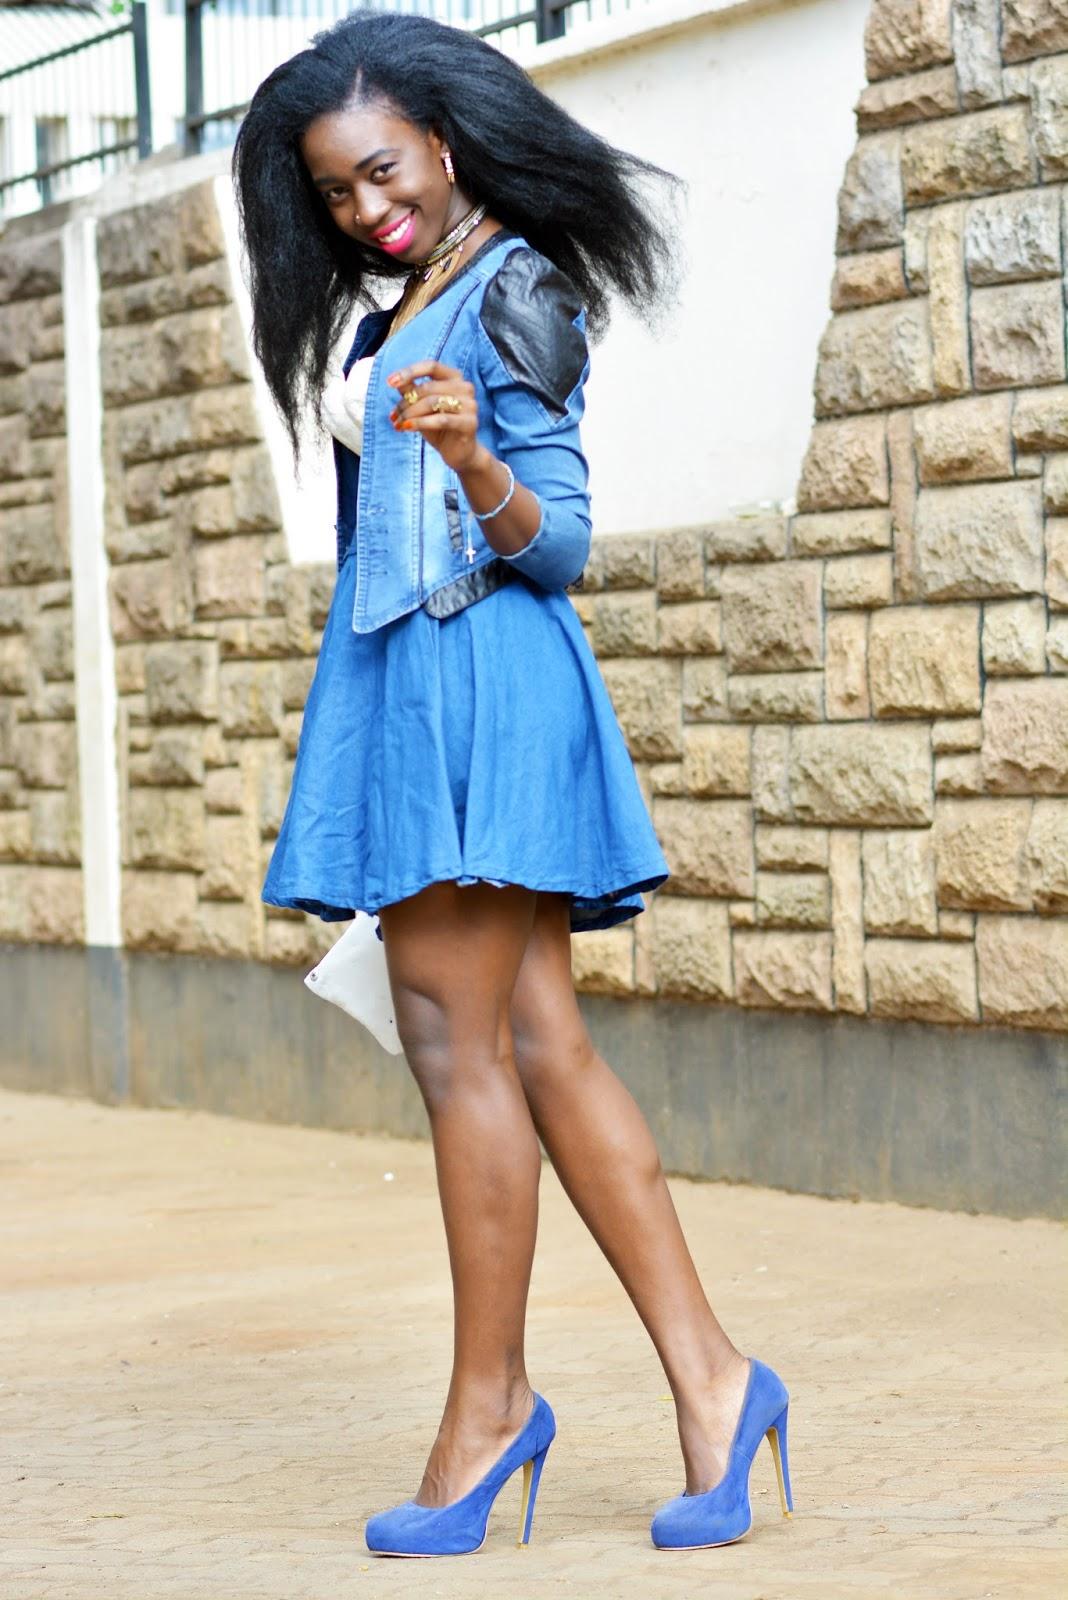 Denim on denim, corset look, denim jeans, denim circle skirt, blue heels, Ezil, style with ezil, African fashion blogging, Kenyan Fashion blogger